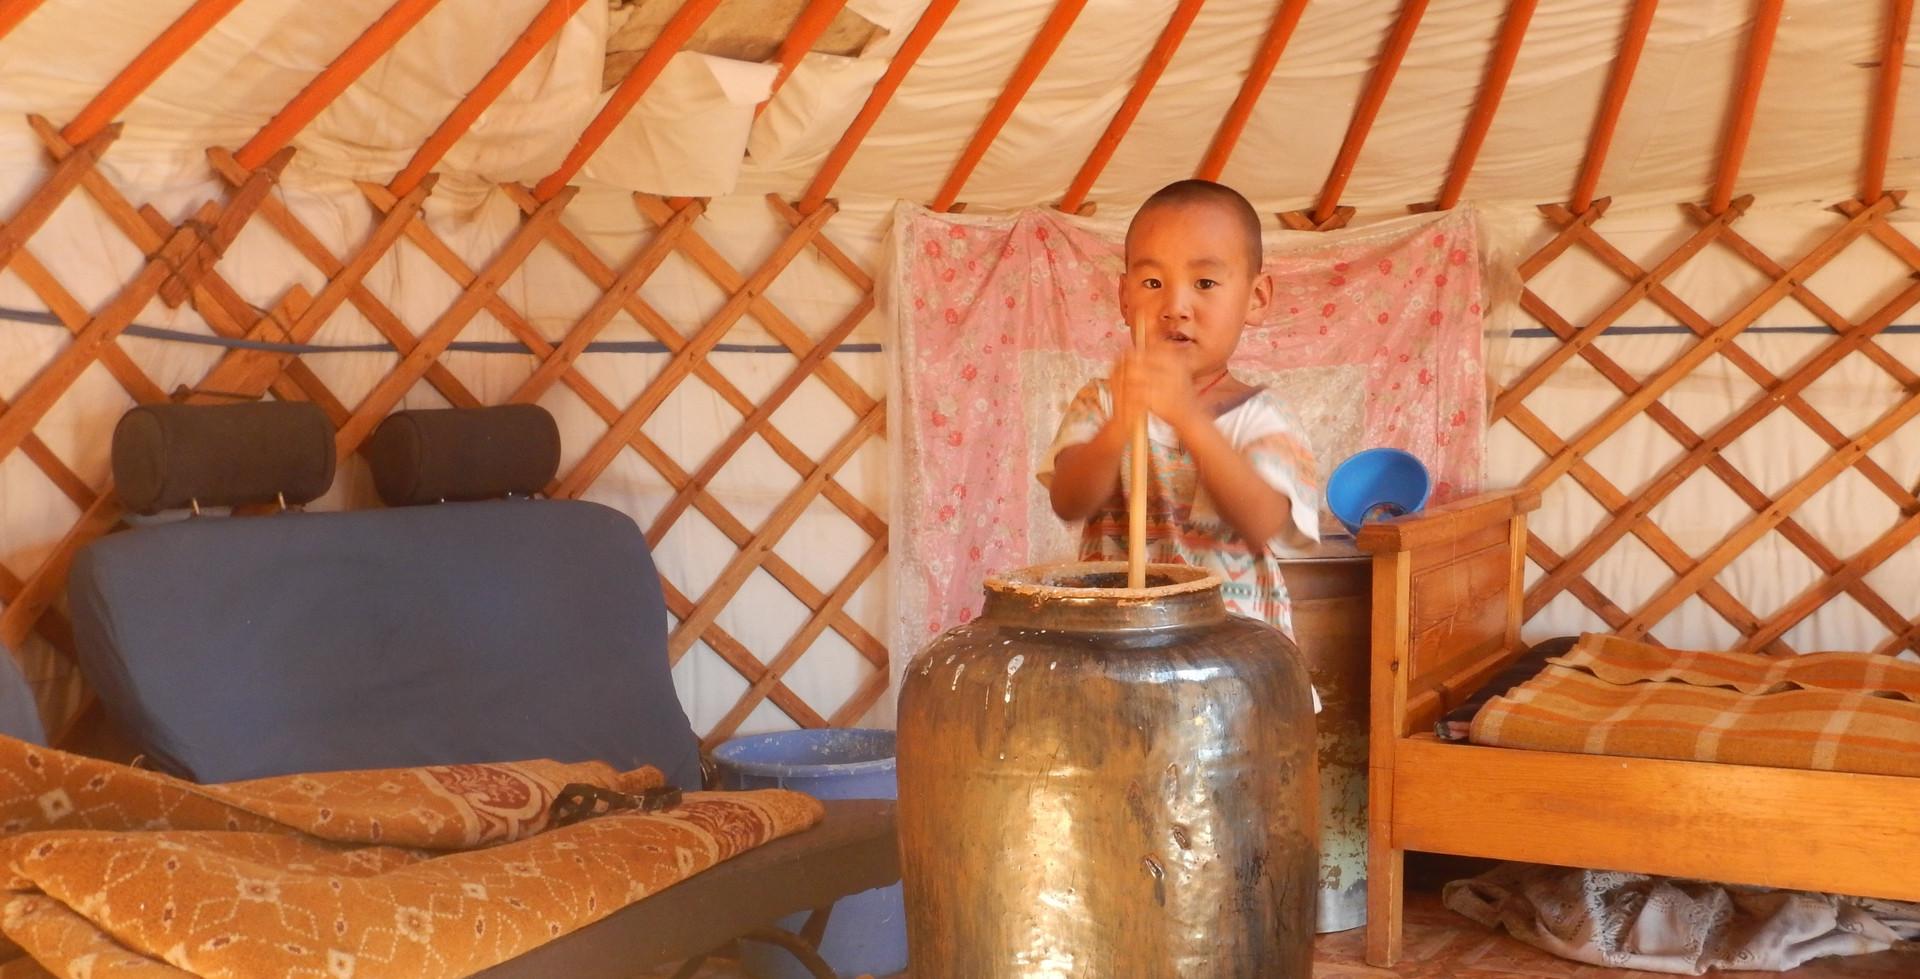 Enfant nomade, Дундговь, Сайхан-Овоо сумын